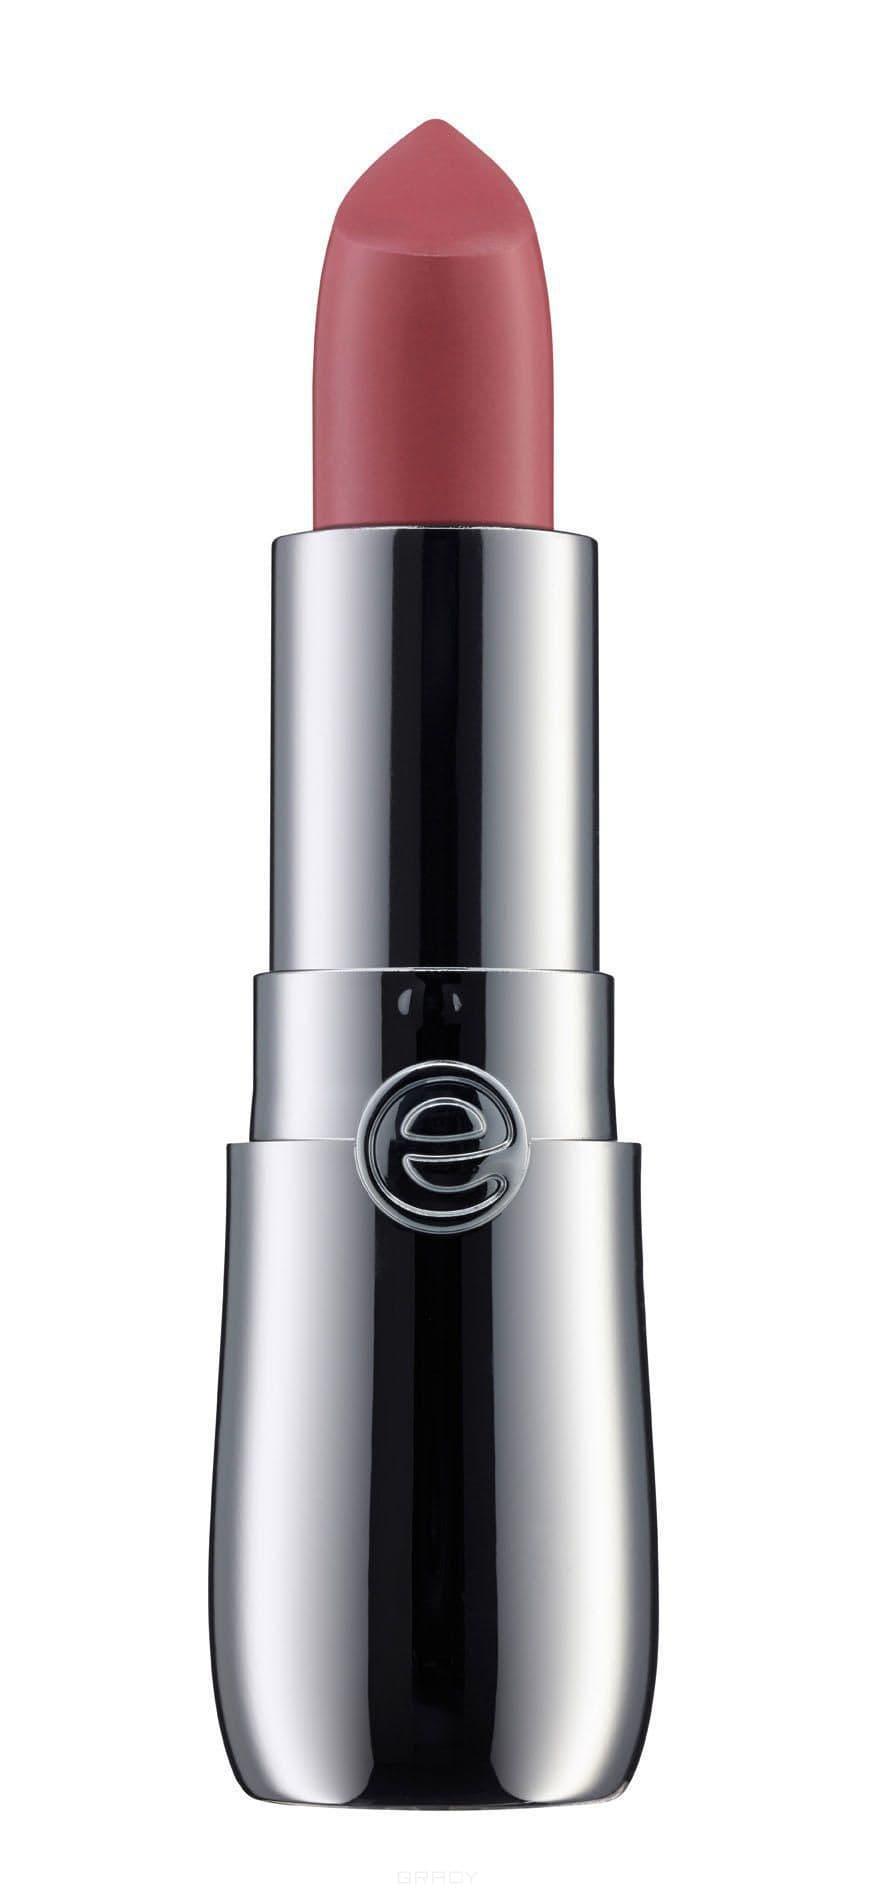 все цены на Essence, Сияющая губная помада Colour Up! Shine On! Lipstick, 3.5 гр (12 тонов) №10, бежево-розовый онлайн